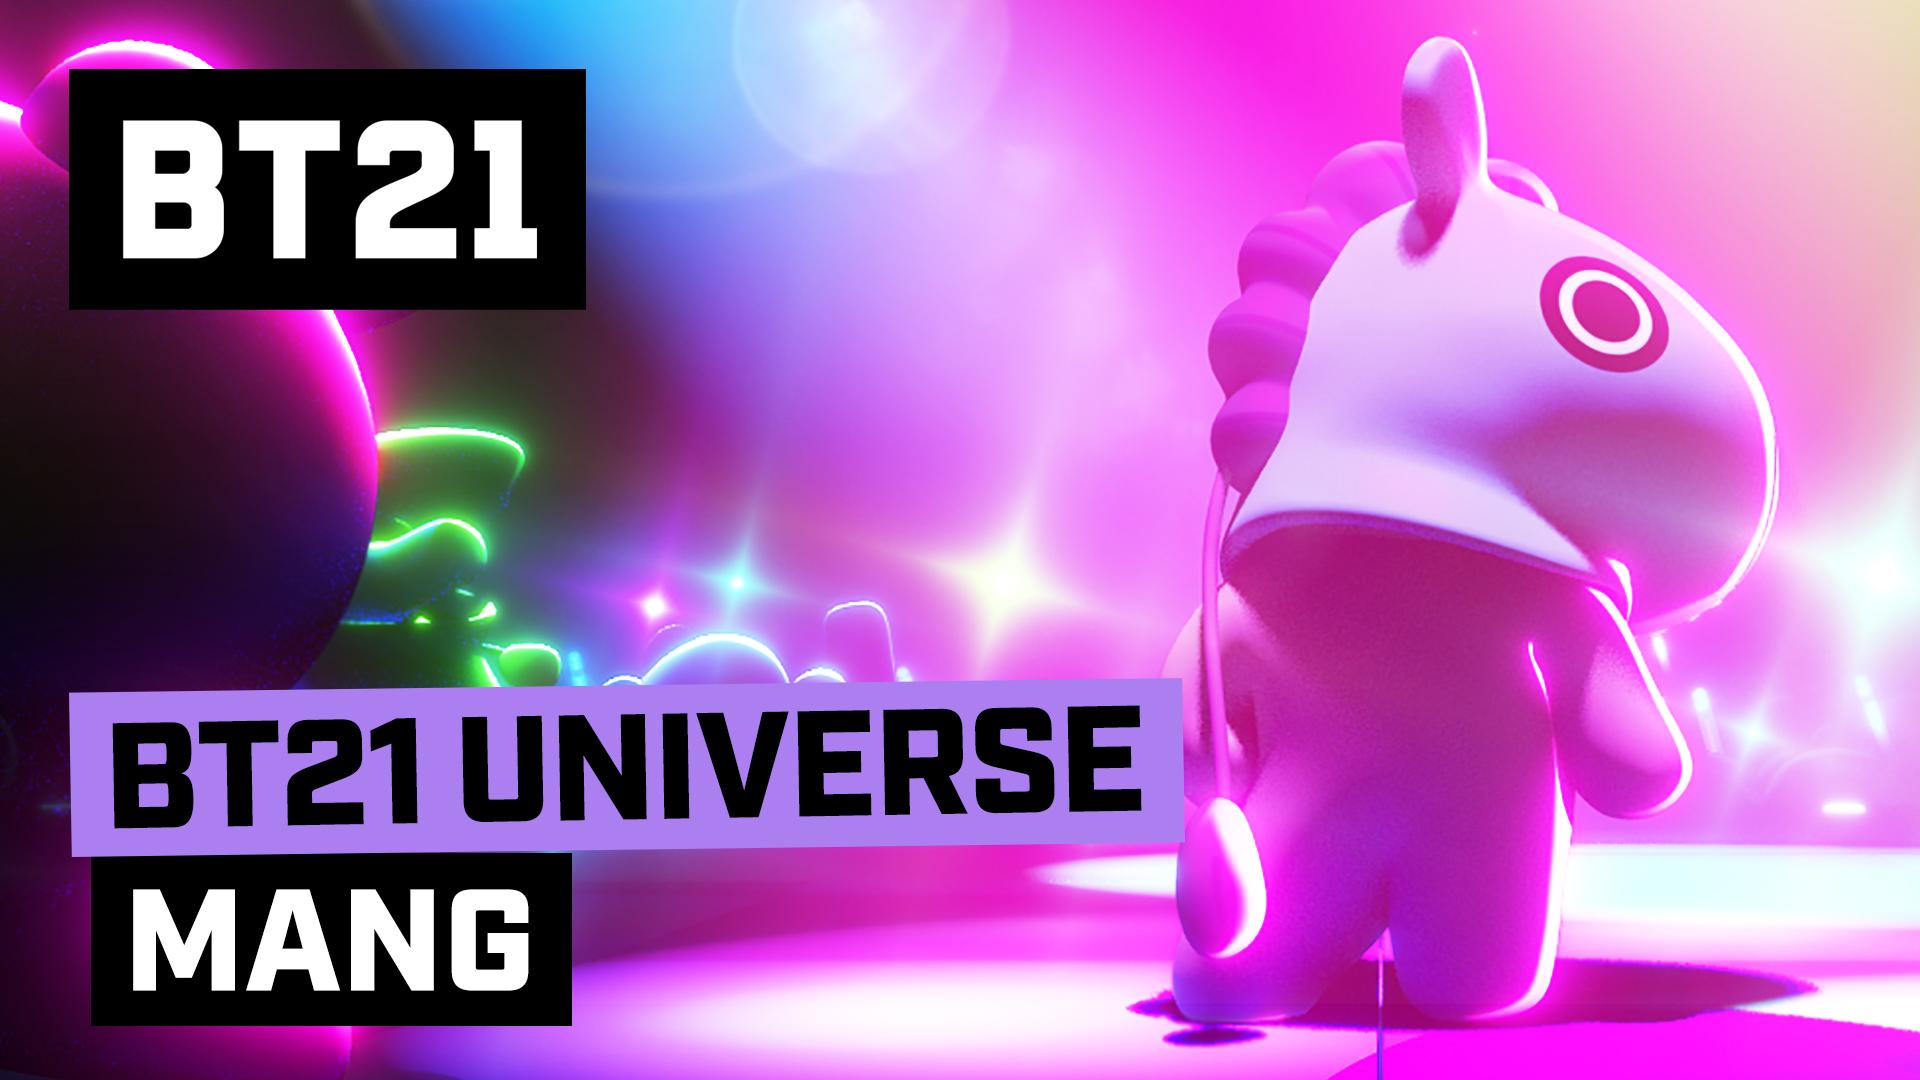 [BT21] BT21 UNIVERSE ANIMATION EP.08 - MANG